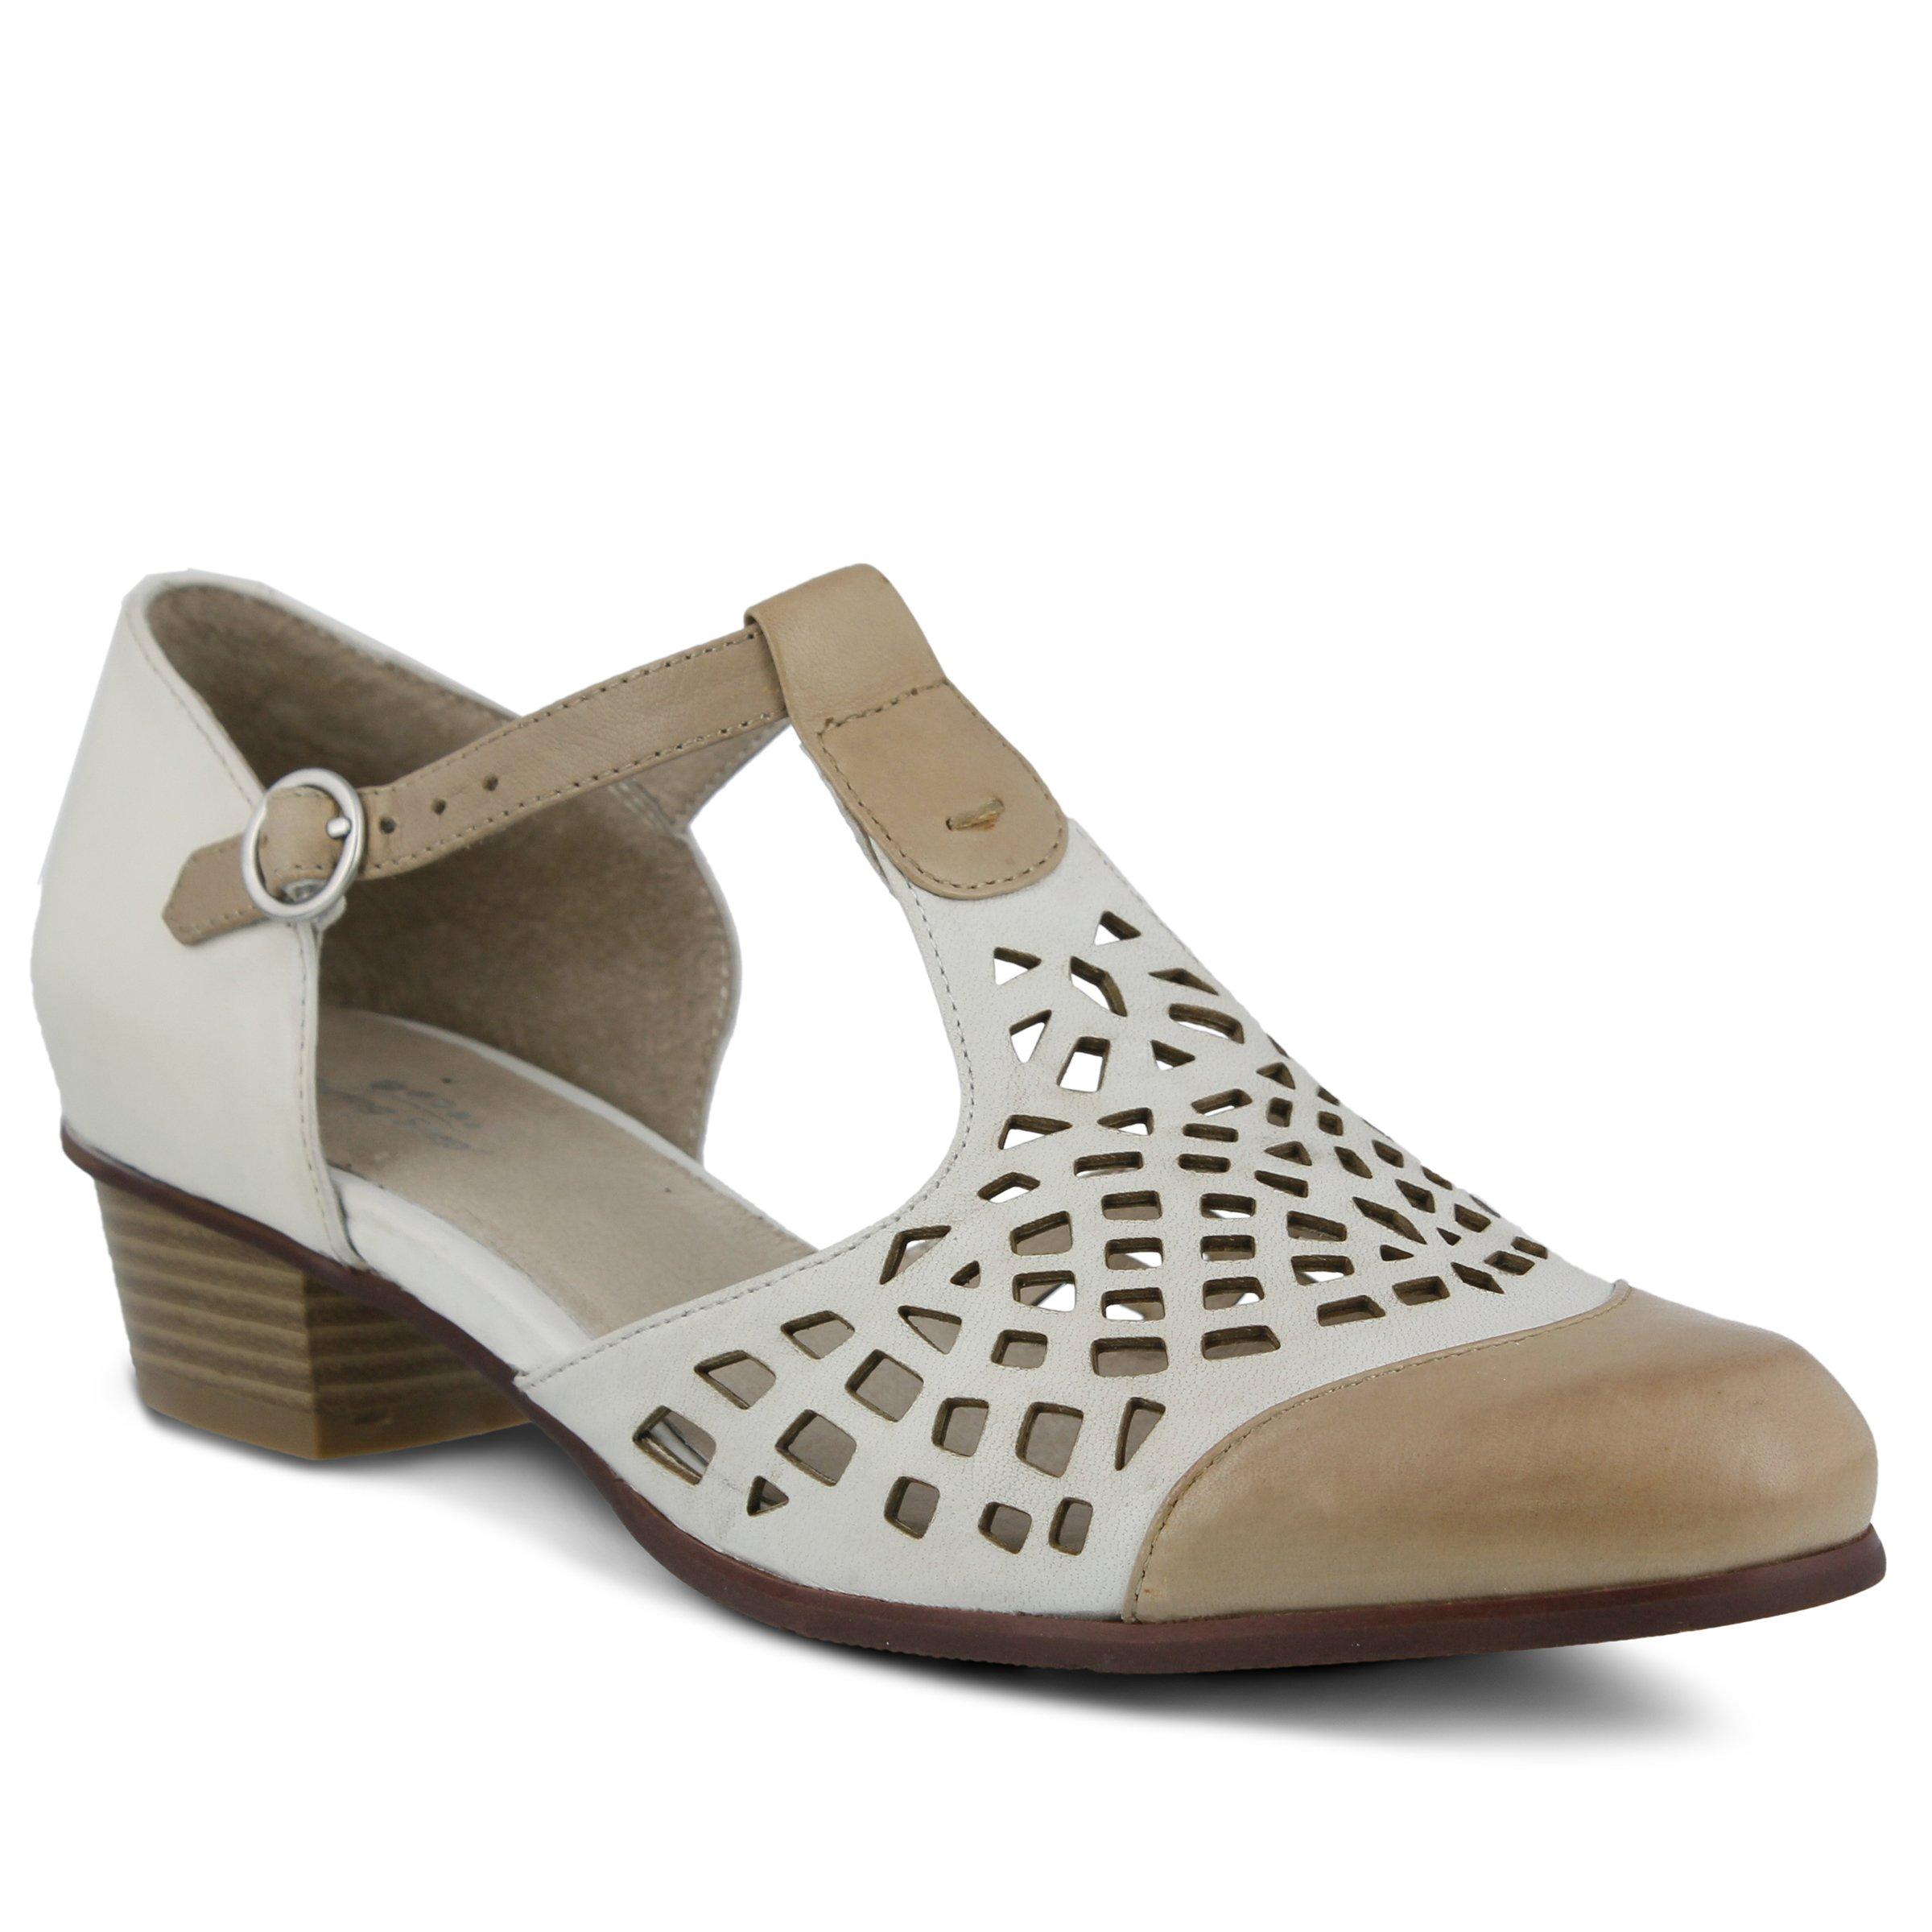 Spring Step Women's Maiche Pump Shoes